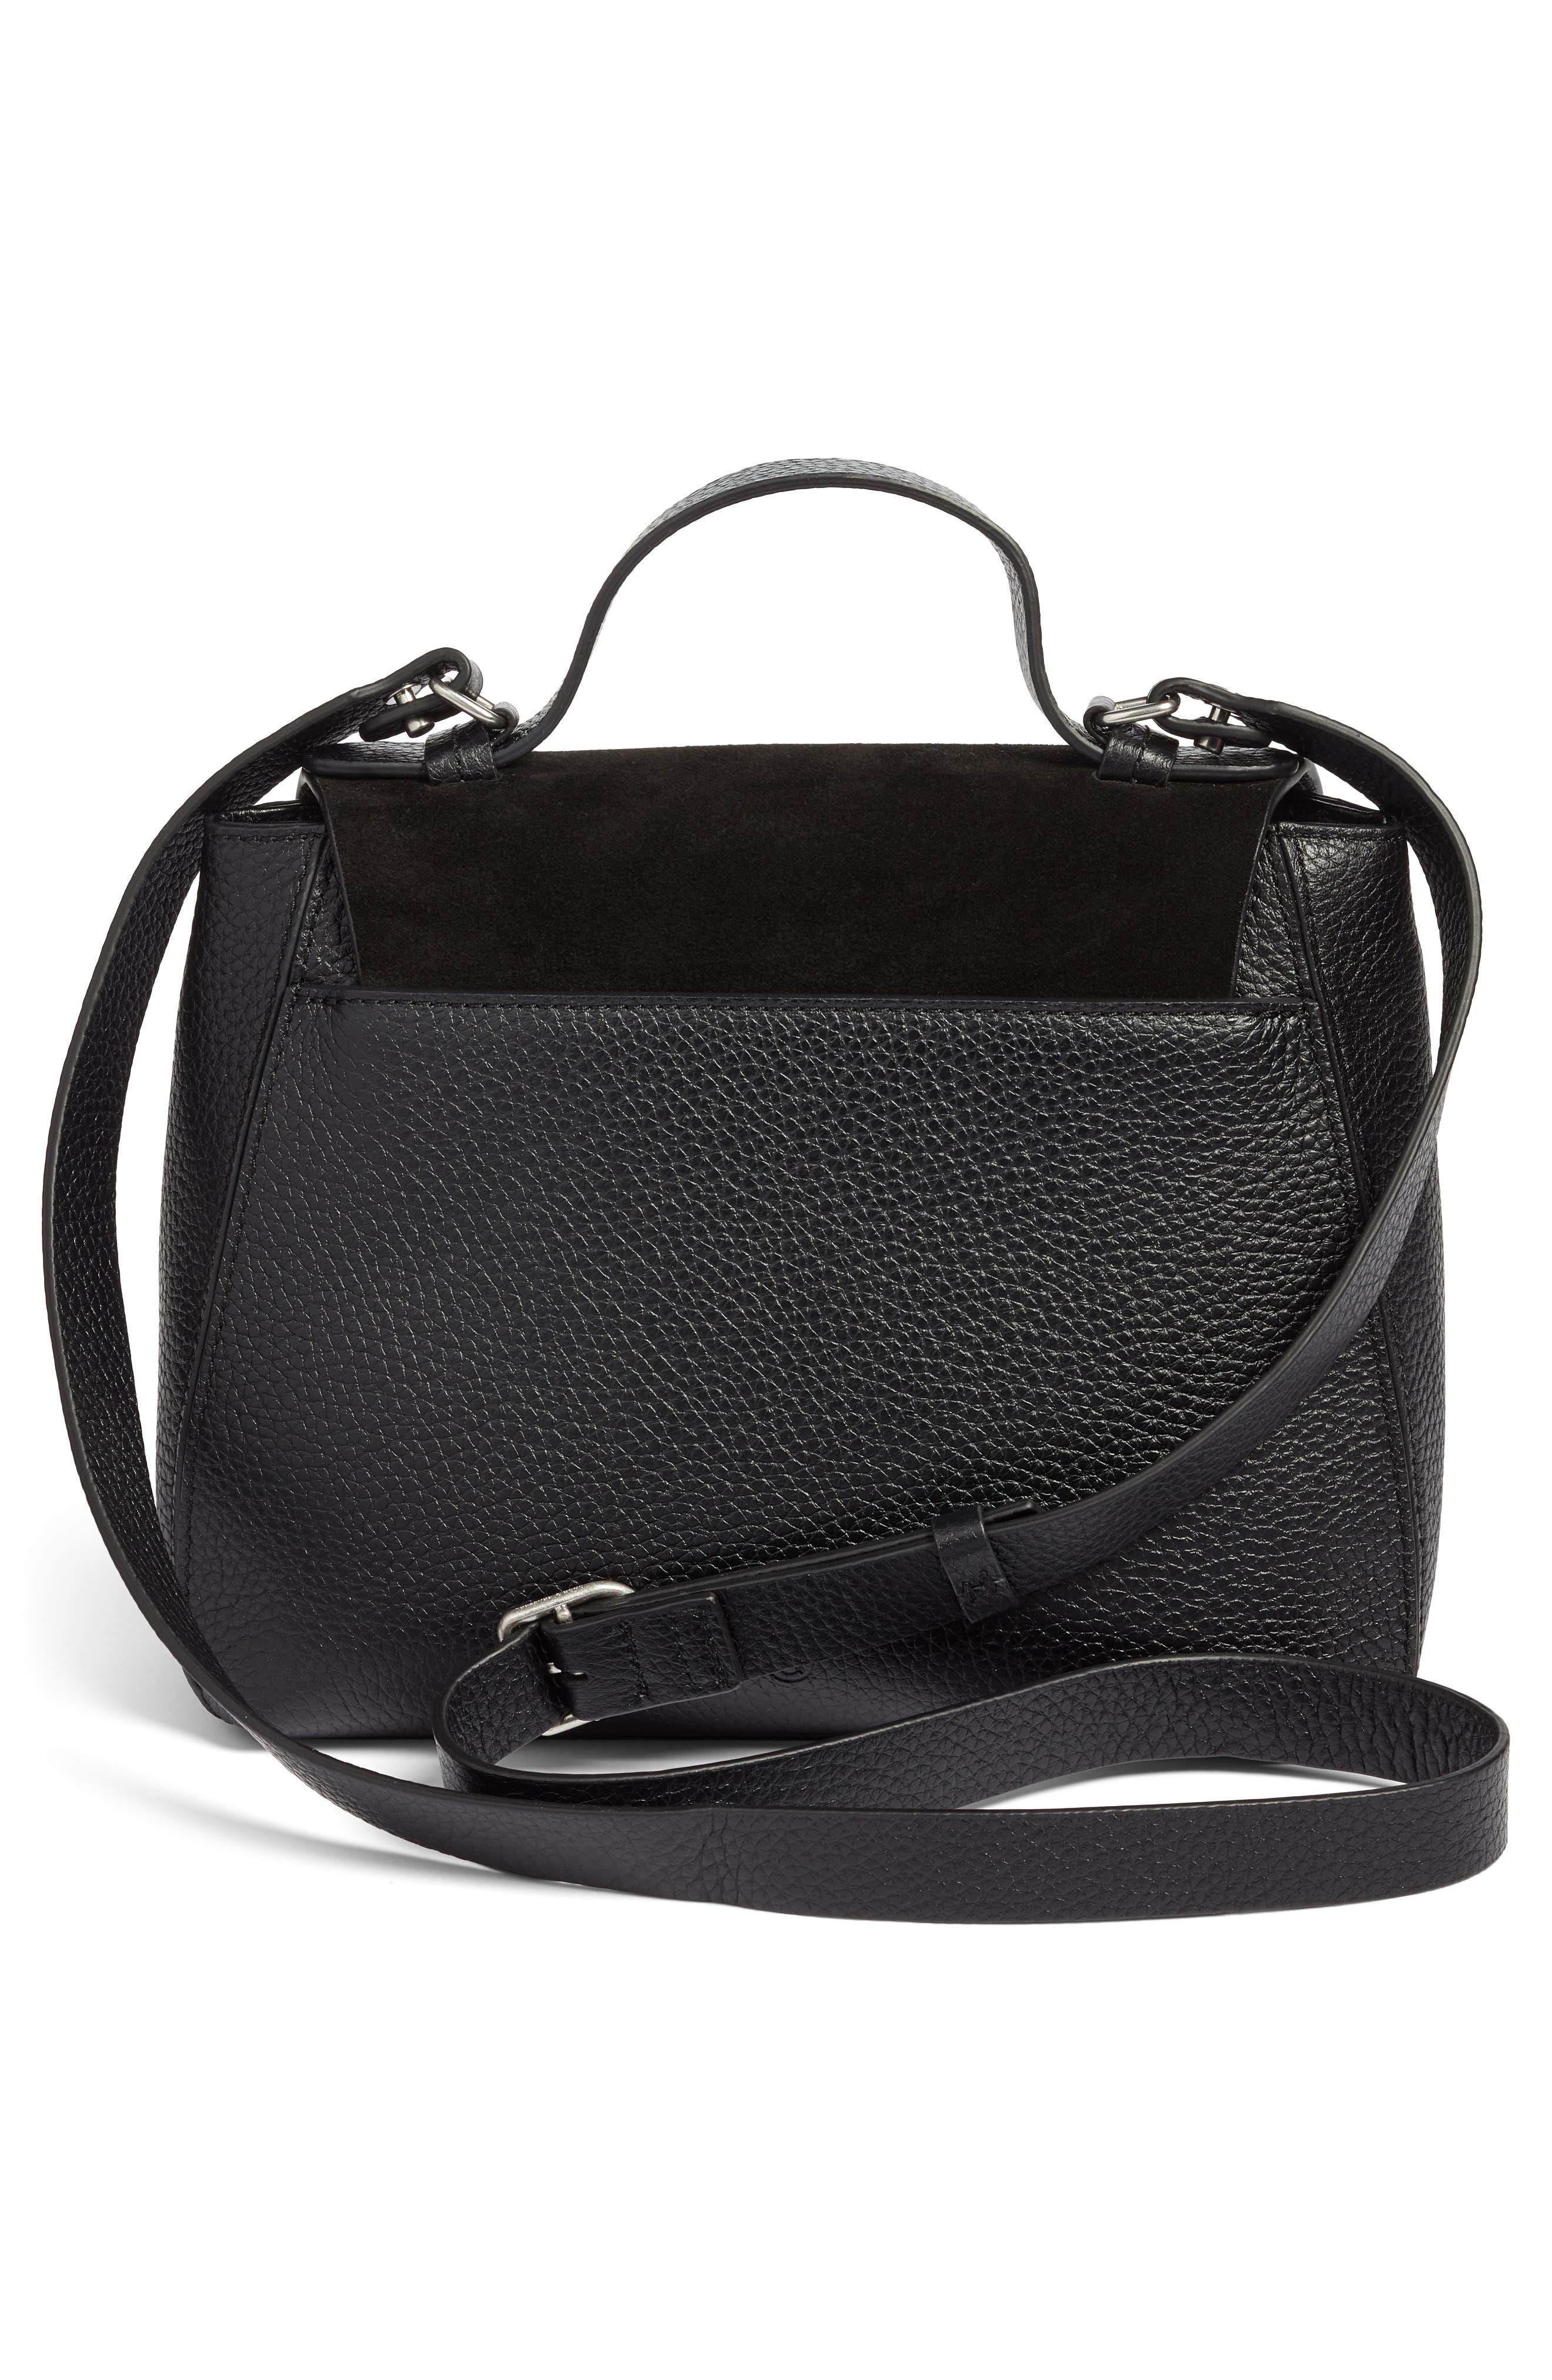 Skyler Leather Top Handle Bag,                             Alternate thumbnail 3, color,                             BLACK